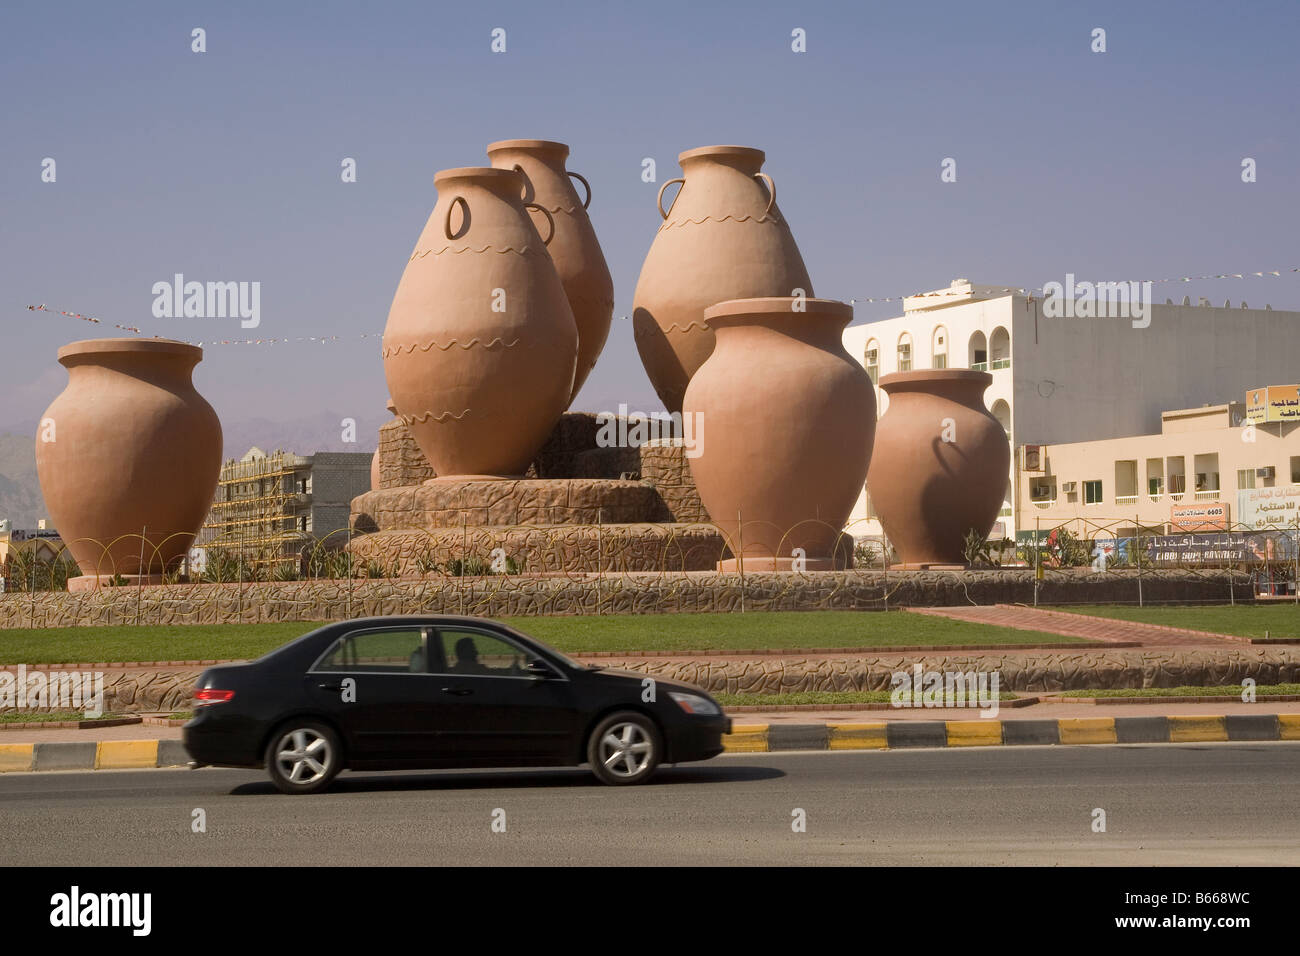 United Arab Emirates Fujairah Dibba traffic roundabout - Stock Image